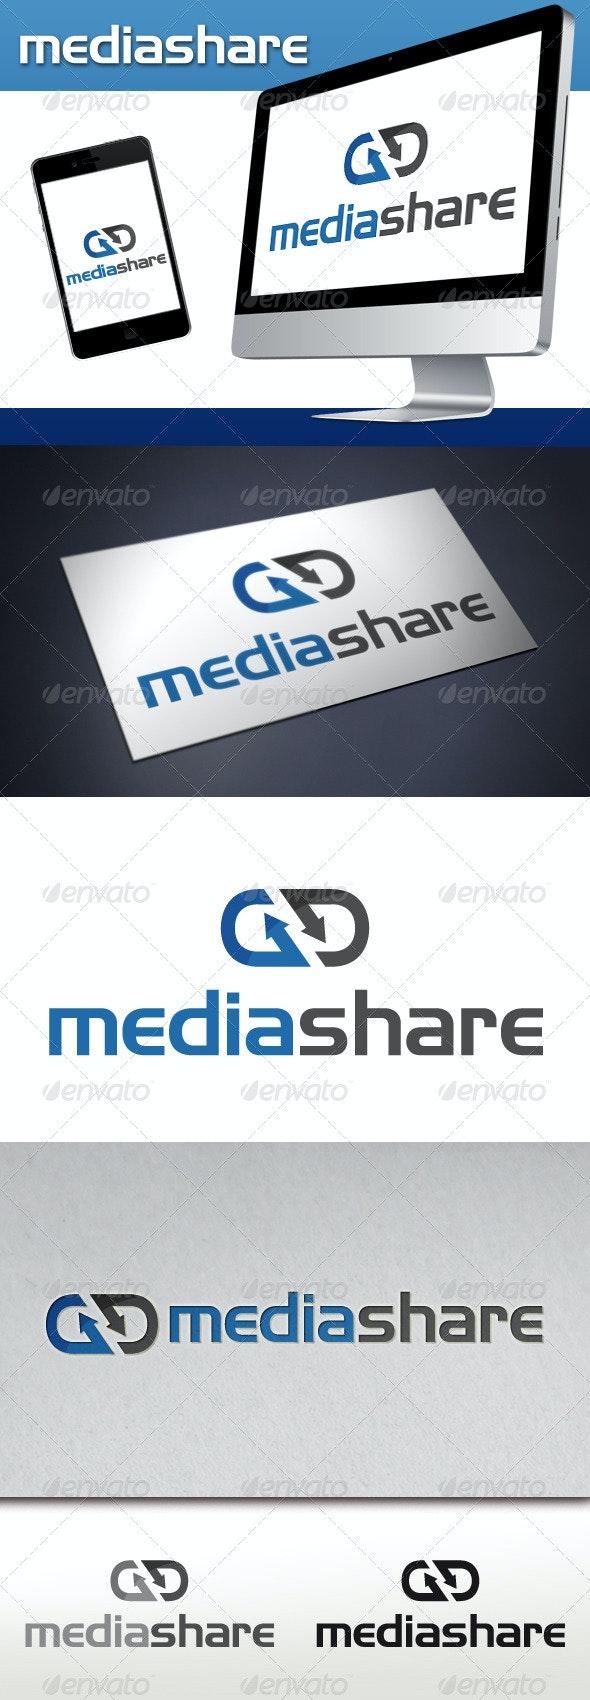 Media Share Hosting Logo - Vector Abstract